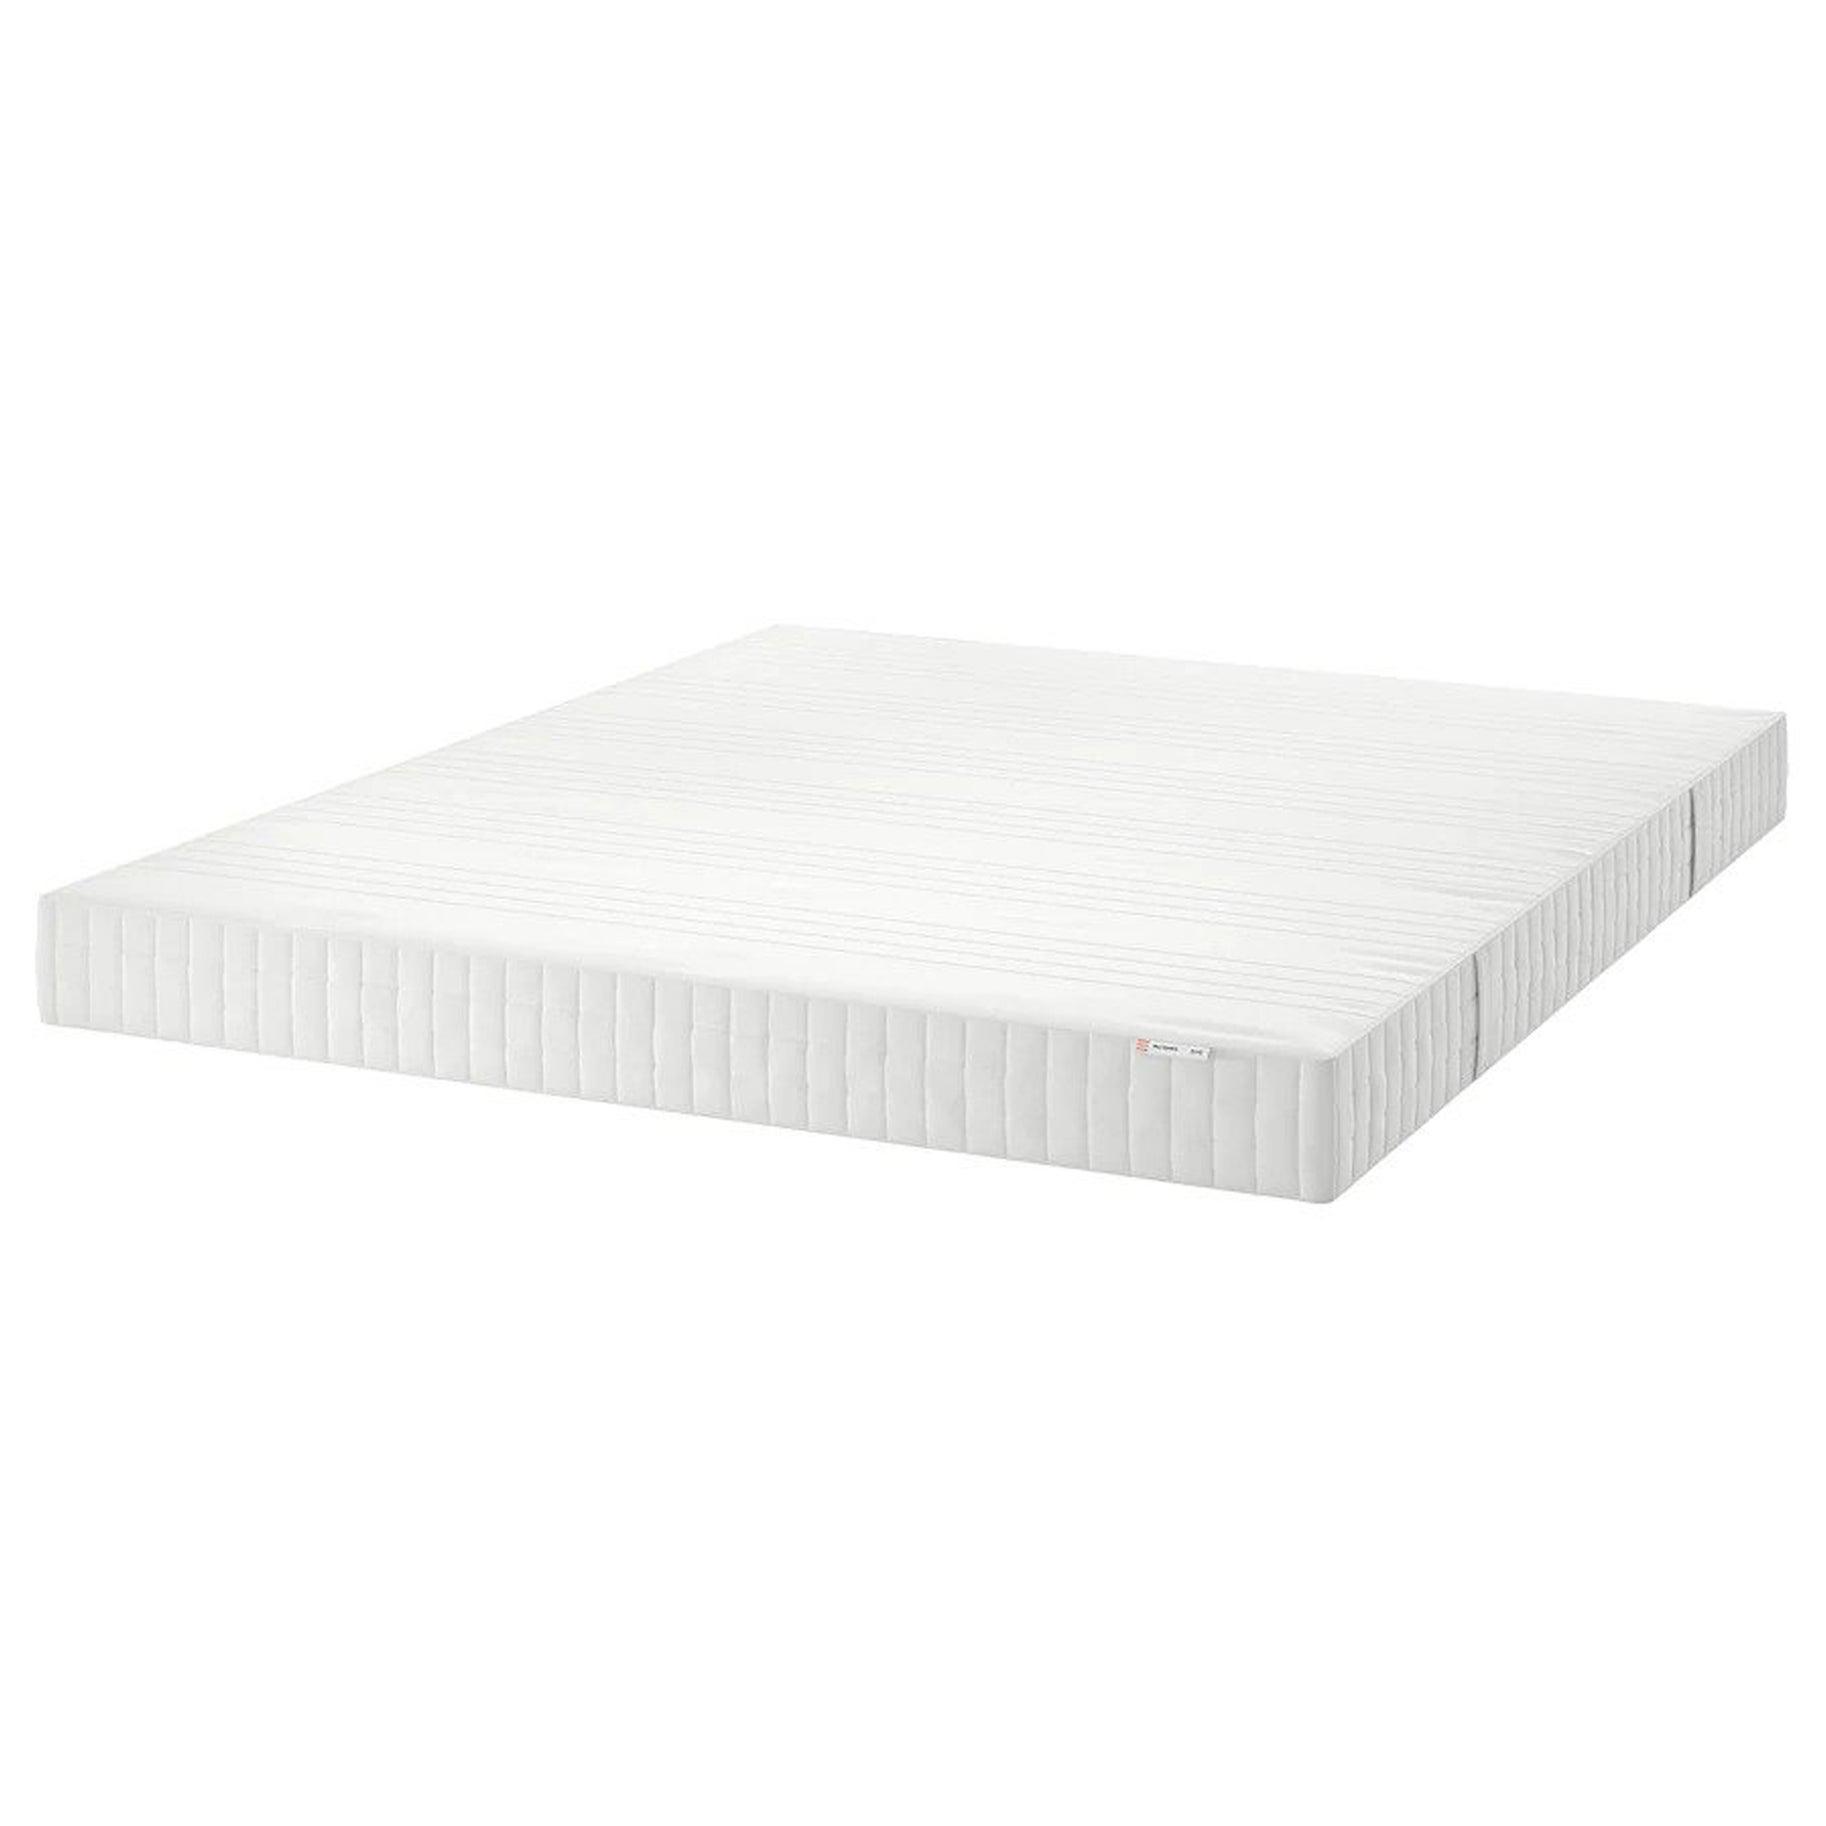 The Best Affordable Mattresses Option: IKEA Matrand Memory Foam